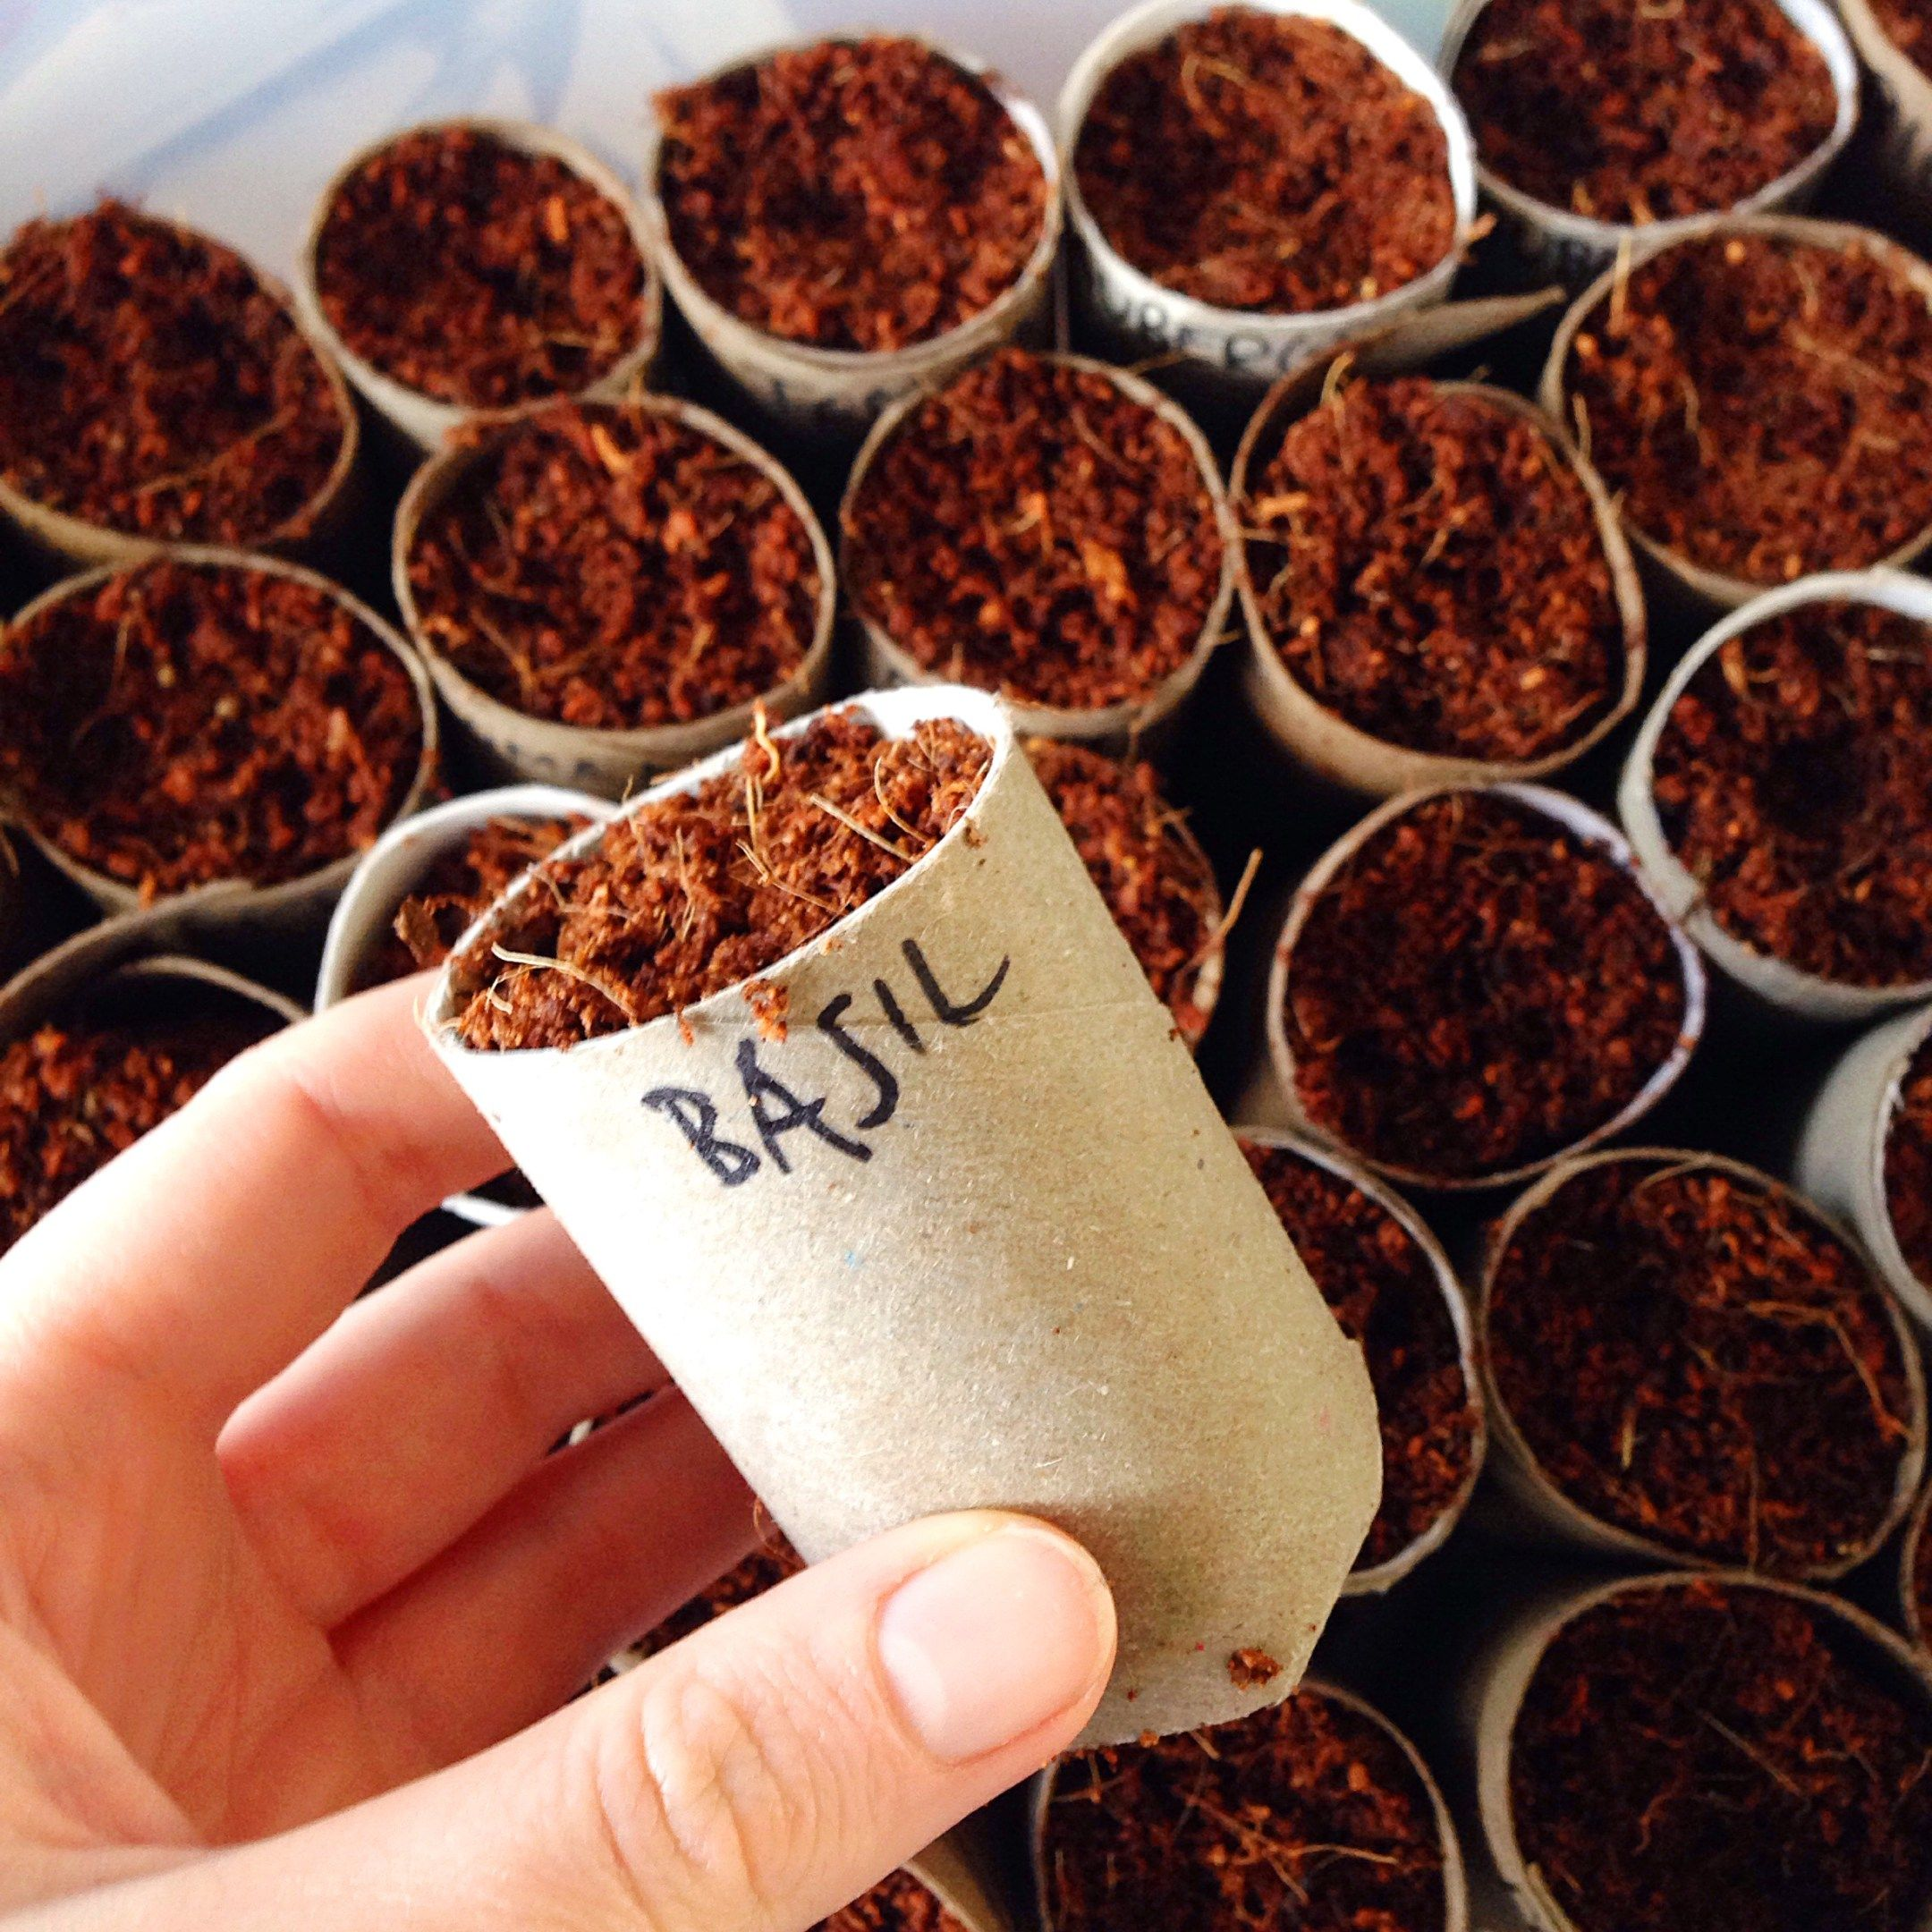 Diy Biodegradable Pots: DIY - Biodegradable Toilet Roll Planters